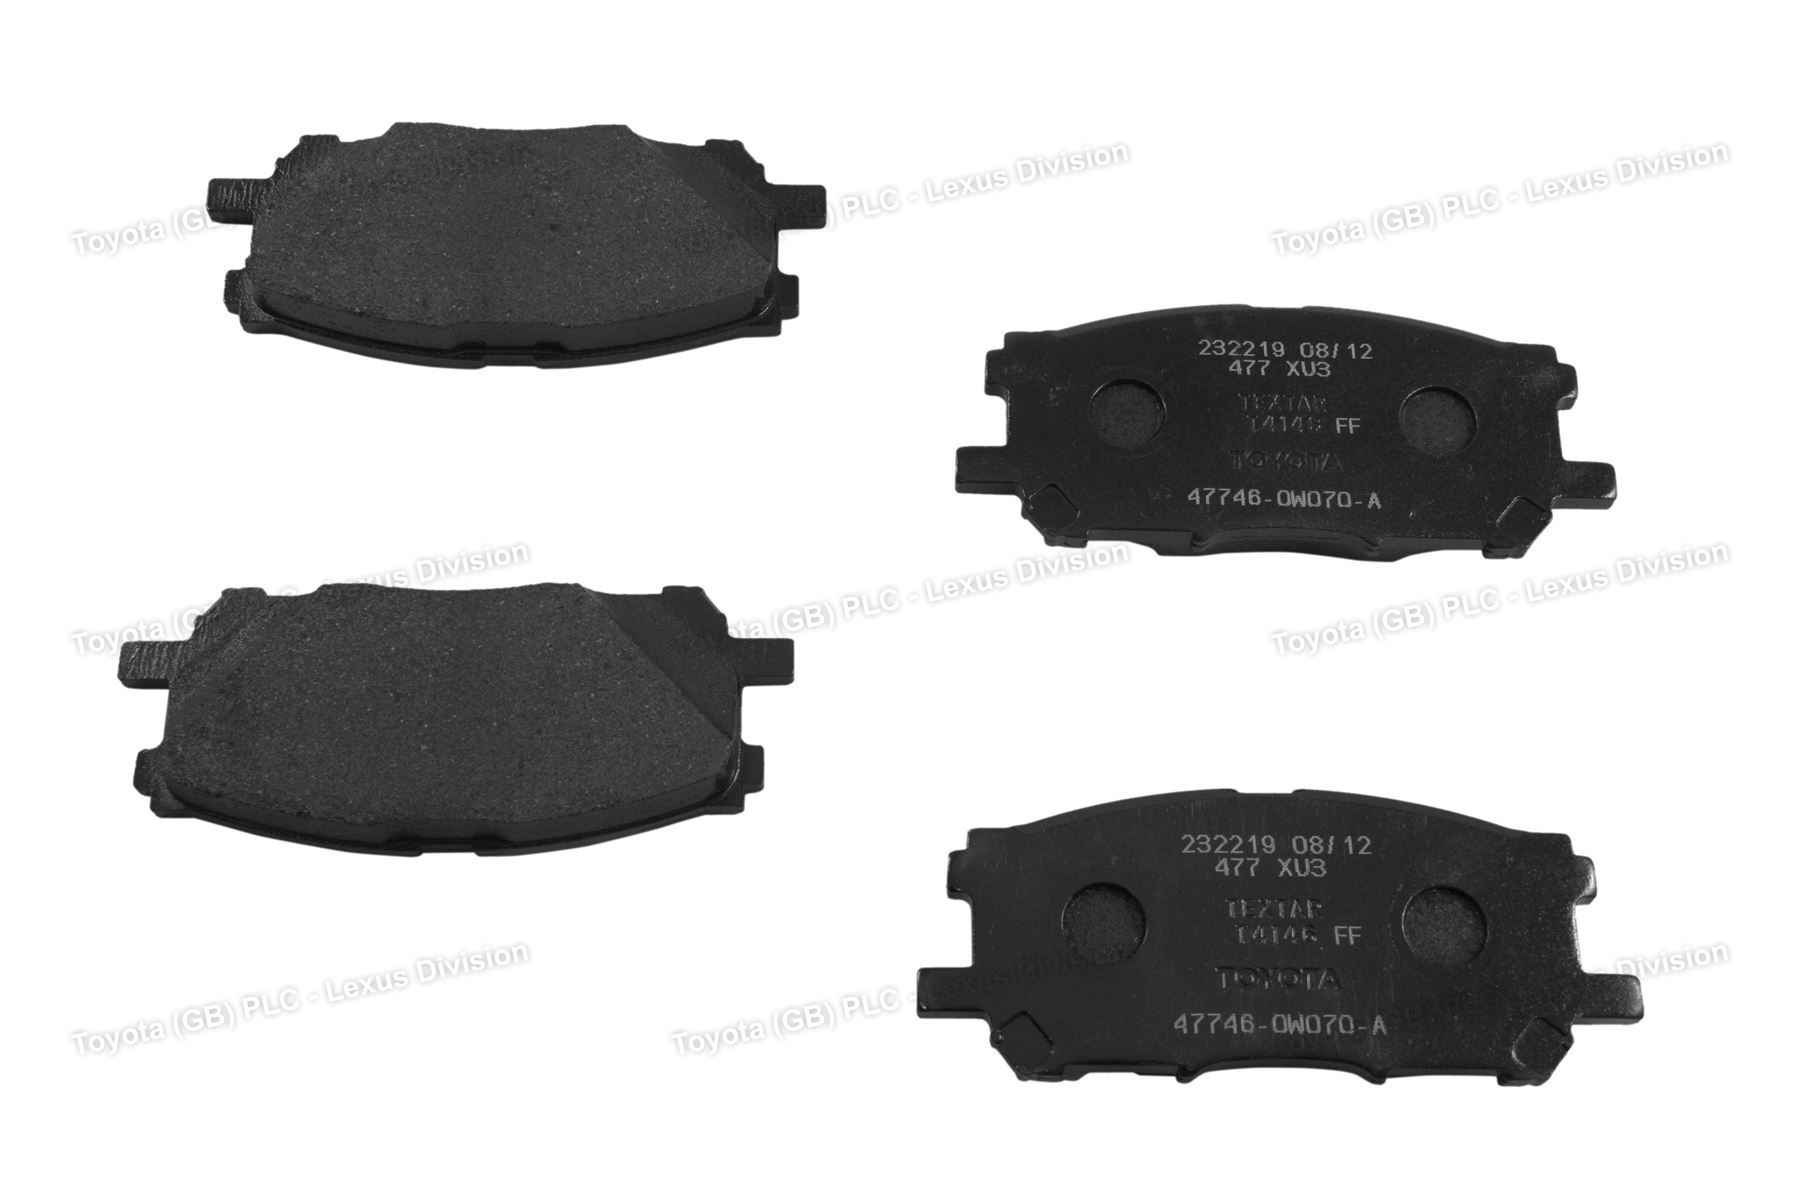 Genuine Lexus RX Car Replacement Pad Kit axle set Brake Disc